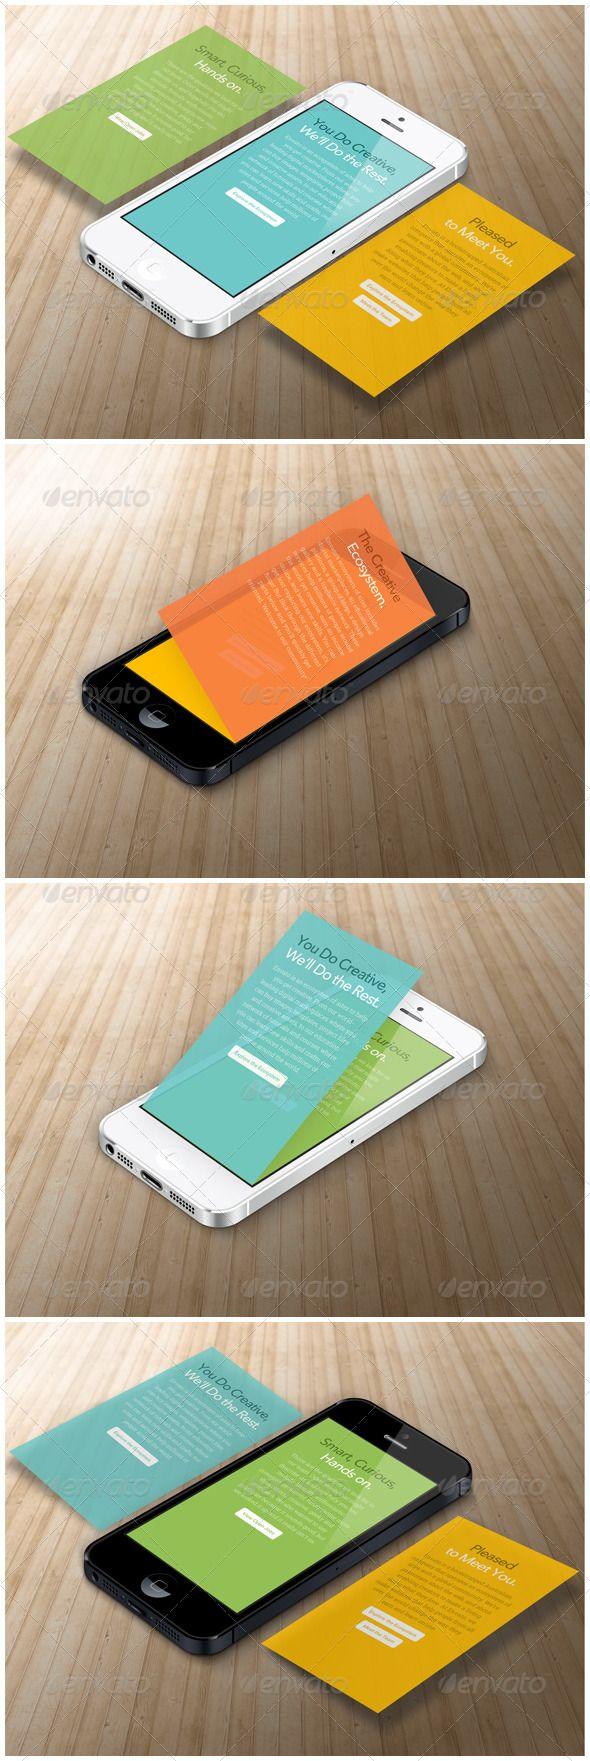 Phone App Mock up - Mobile Displays $4